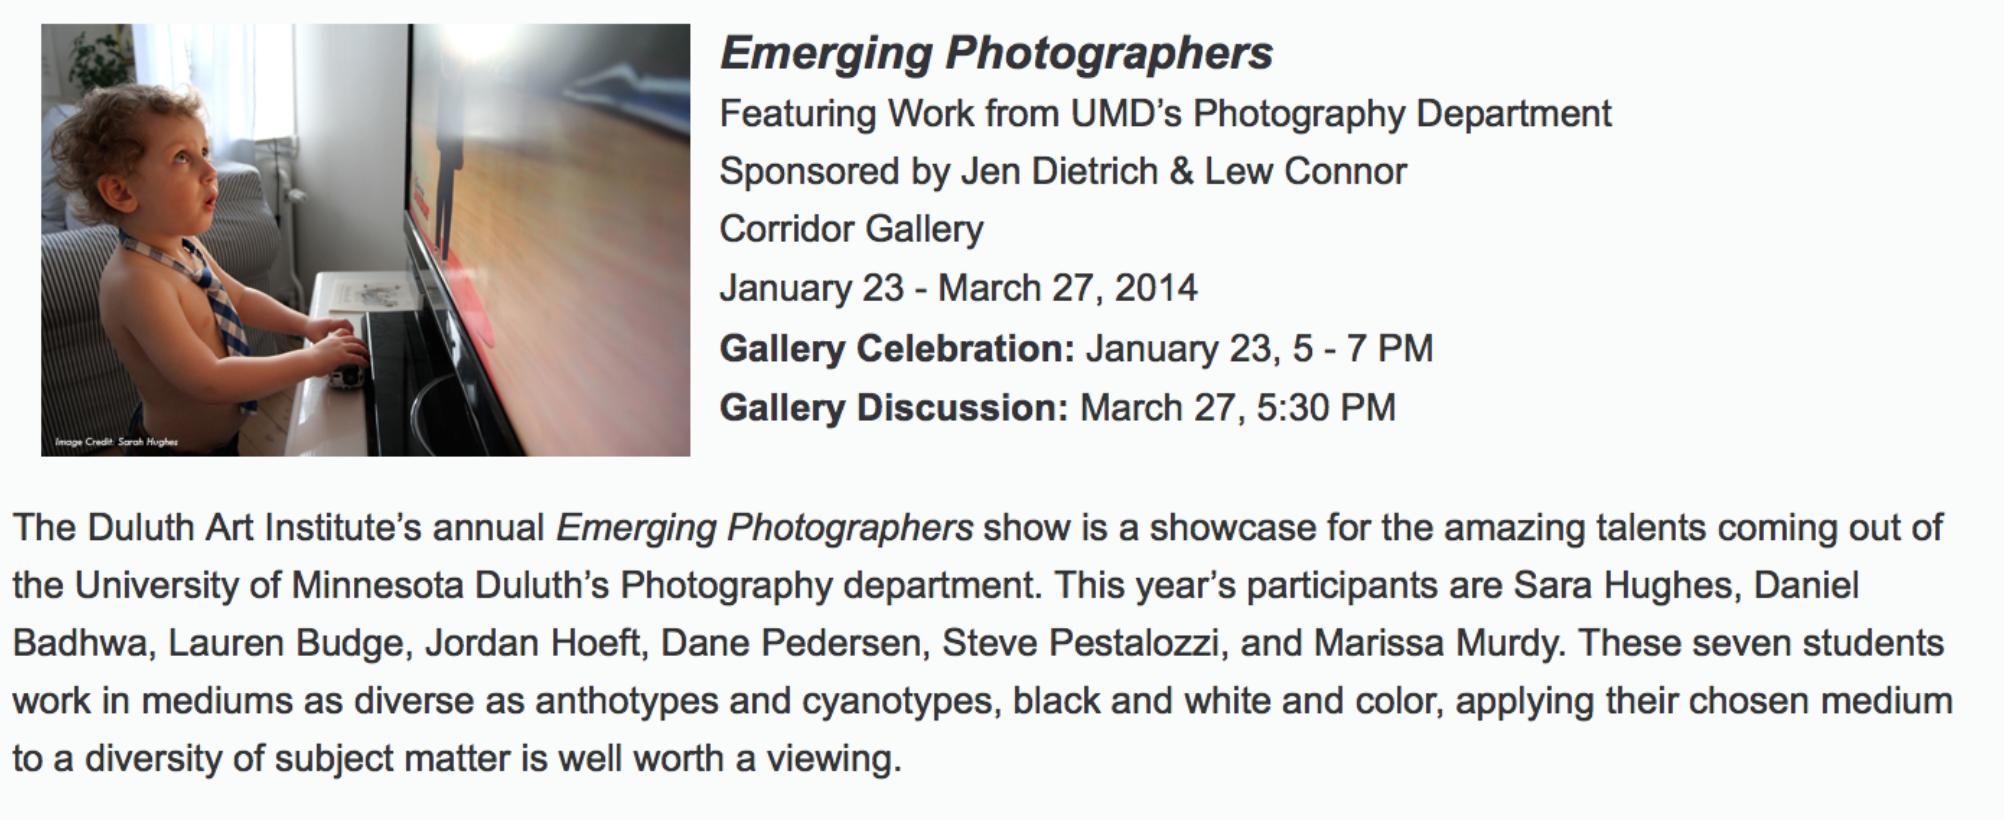 Duluth Art Institute website 1/16/14